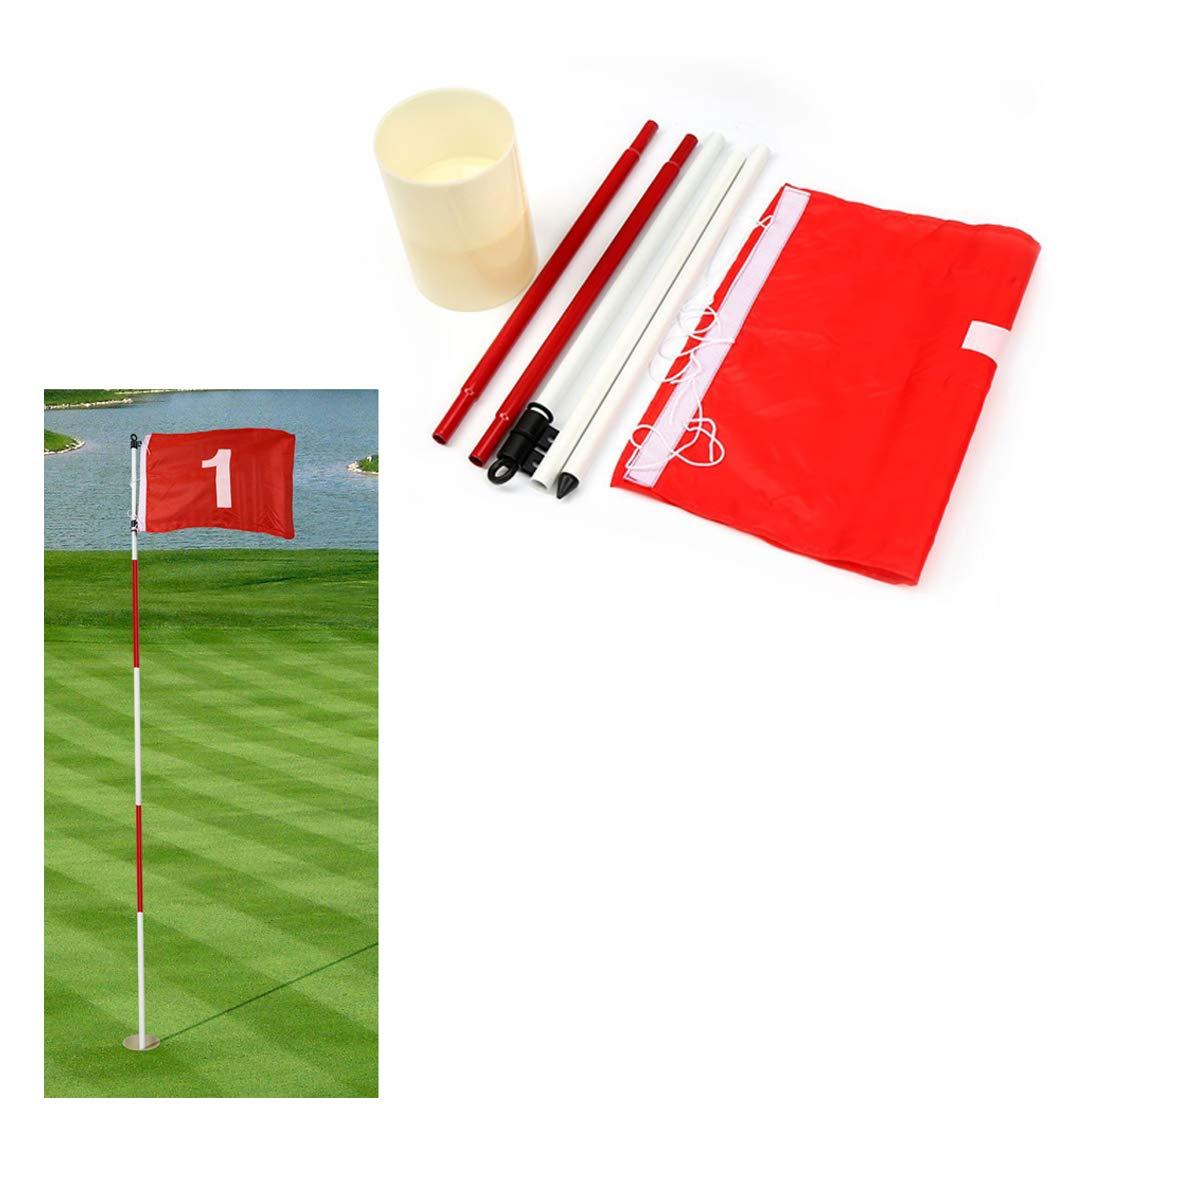 MarketBoss Golf Flag Backyard Practice Golf Hole Cup flagpole 5 Section Golf Green flagpole Golf Flag and flagpole Golf Hole Golf